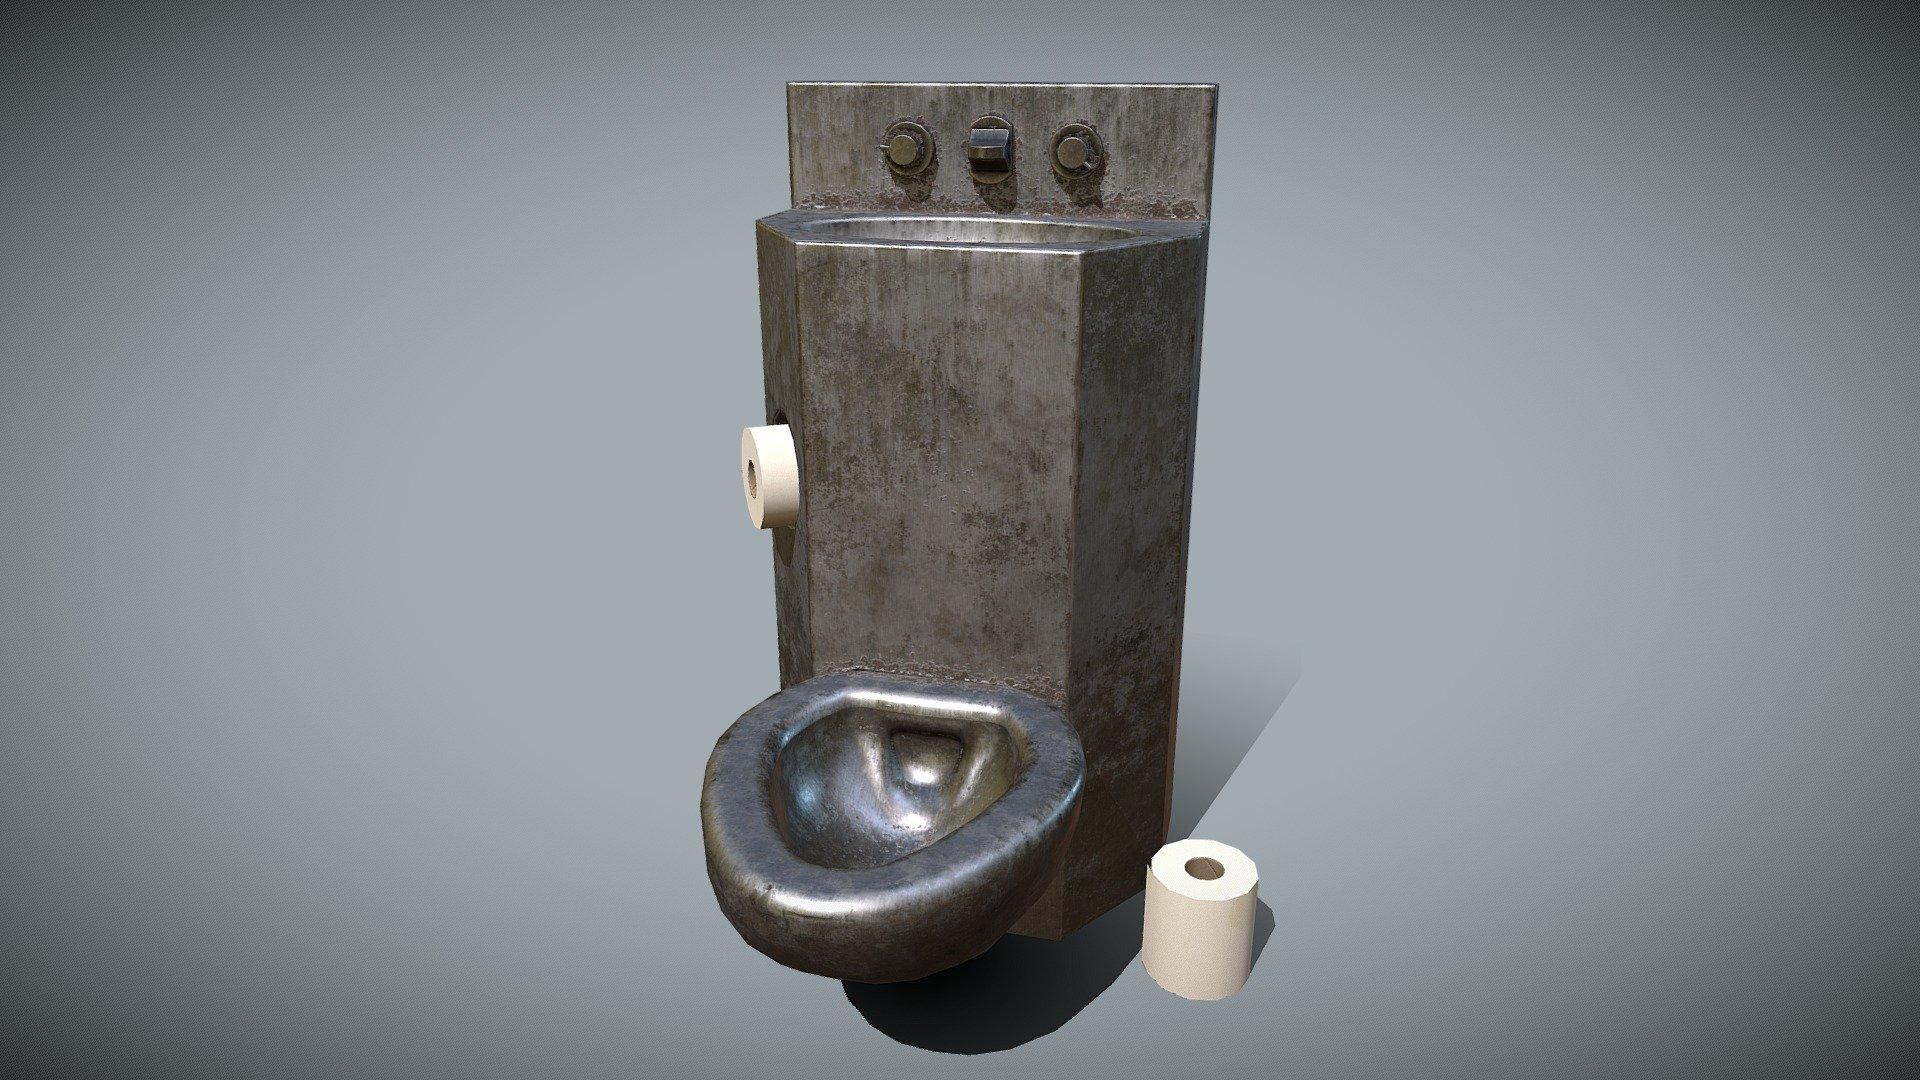 Prison Toilet Sink For Jail Cell Et